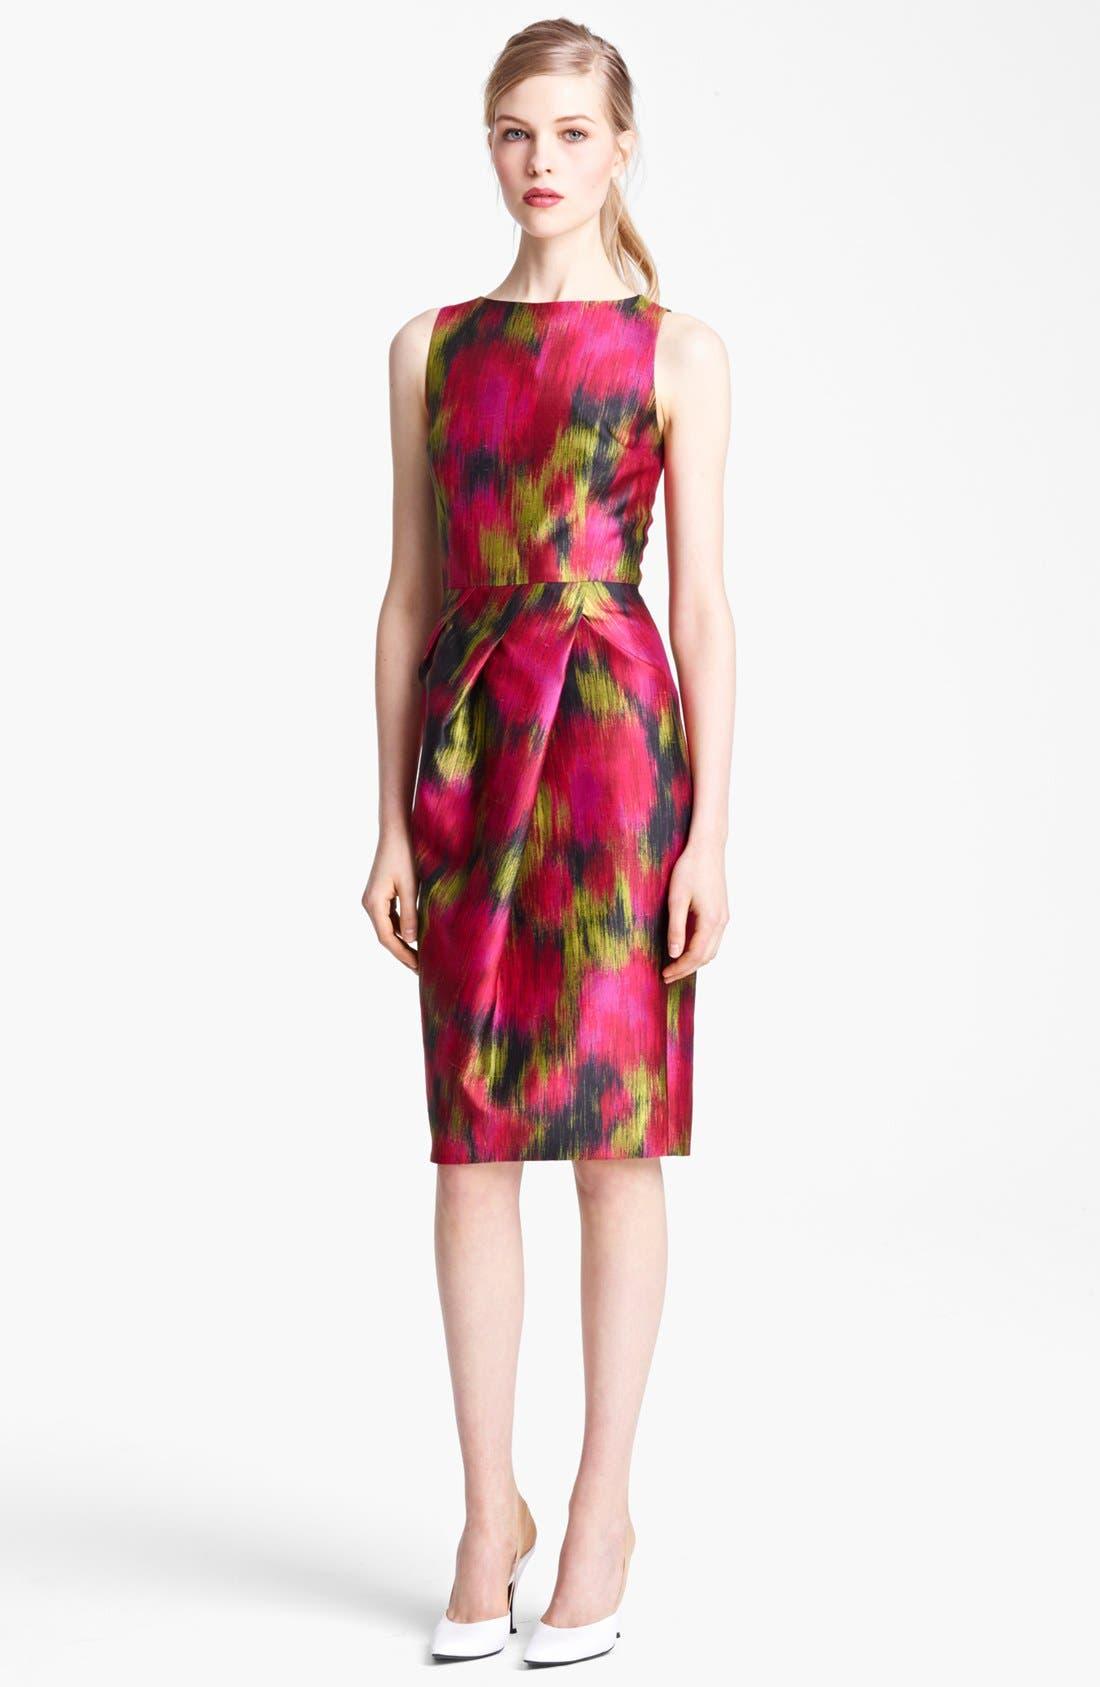 Main Image - Michael Kors Zinnia Print Shantung Dress